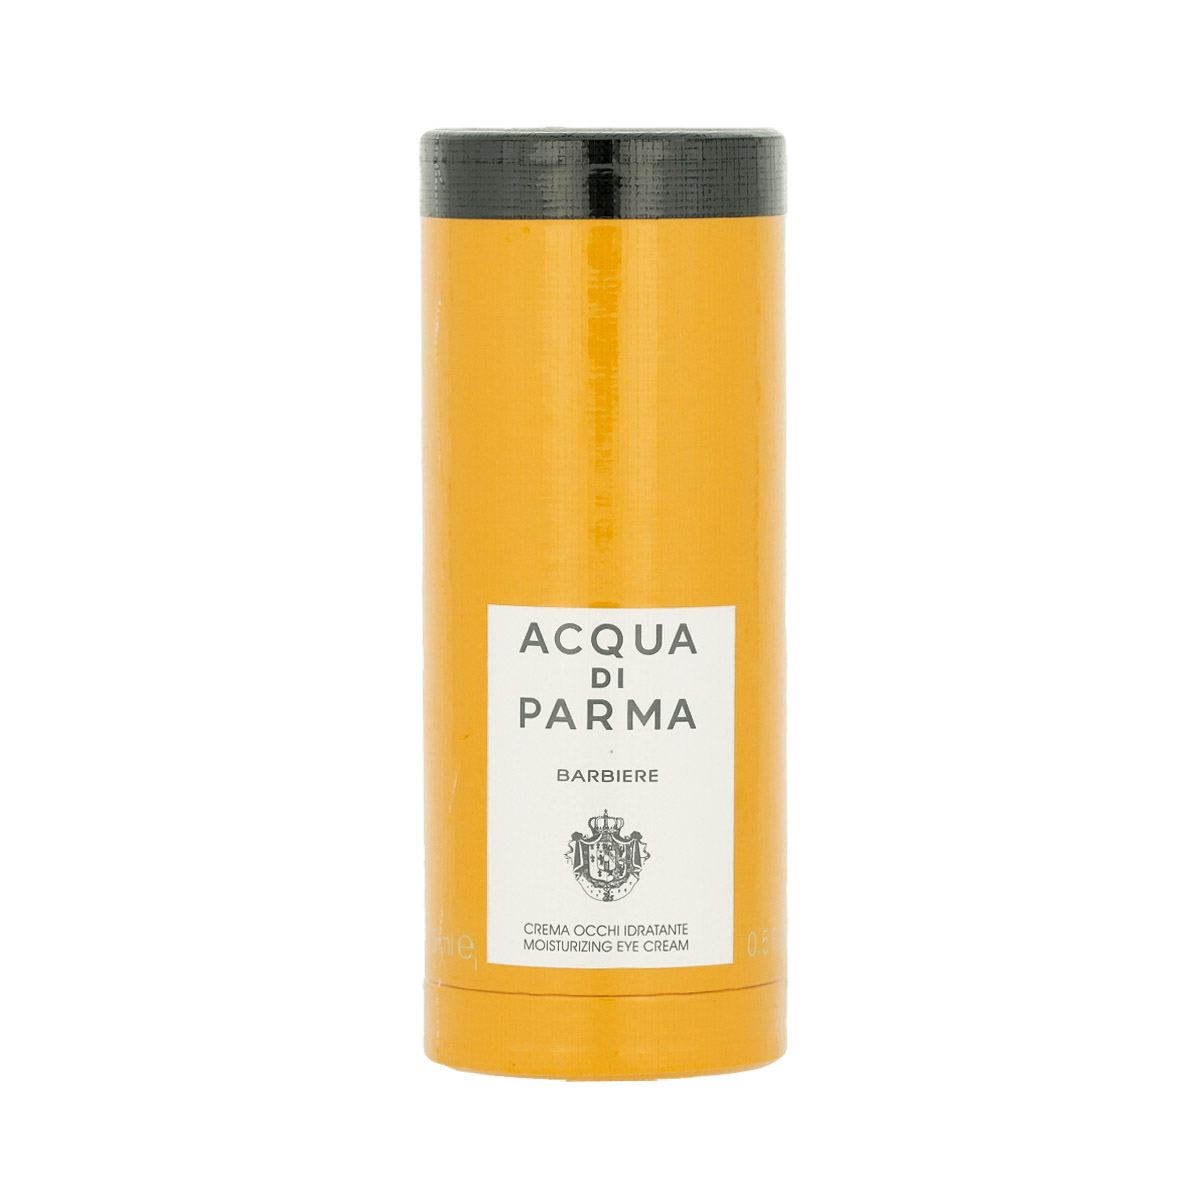 Acqua Di Parma Barbiere Feuchtigkeitsspendende Augencreme 15 ml (man) 21650